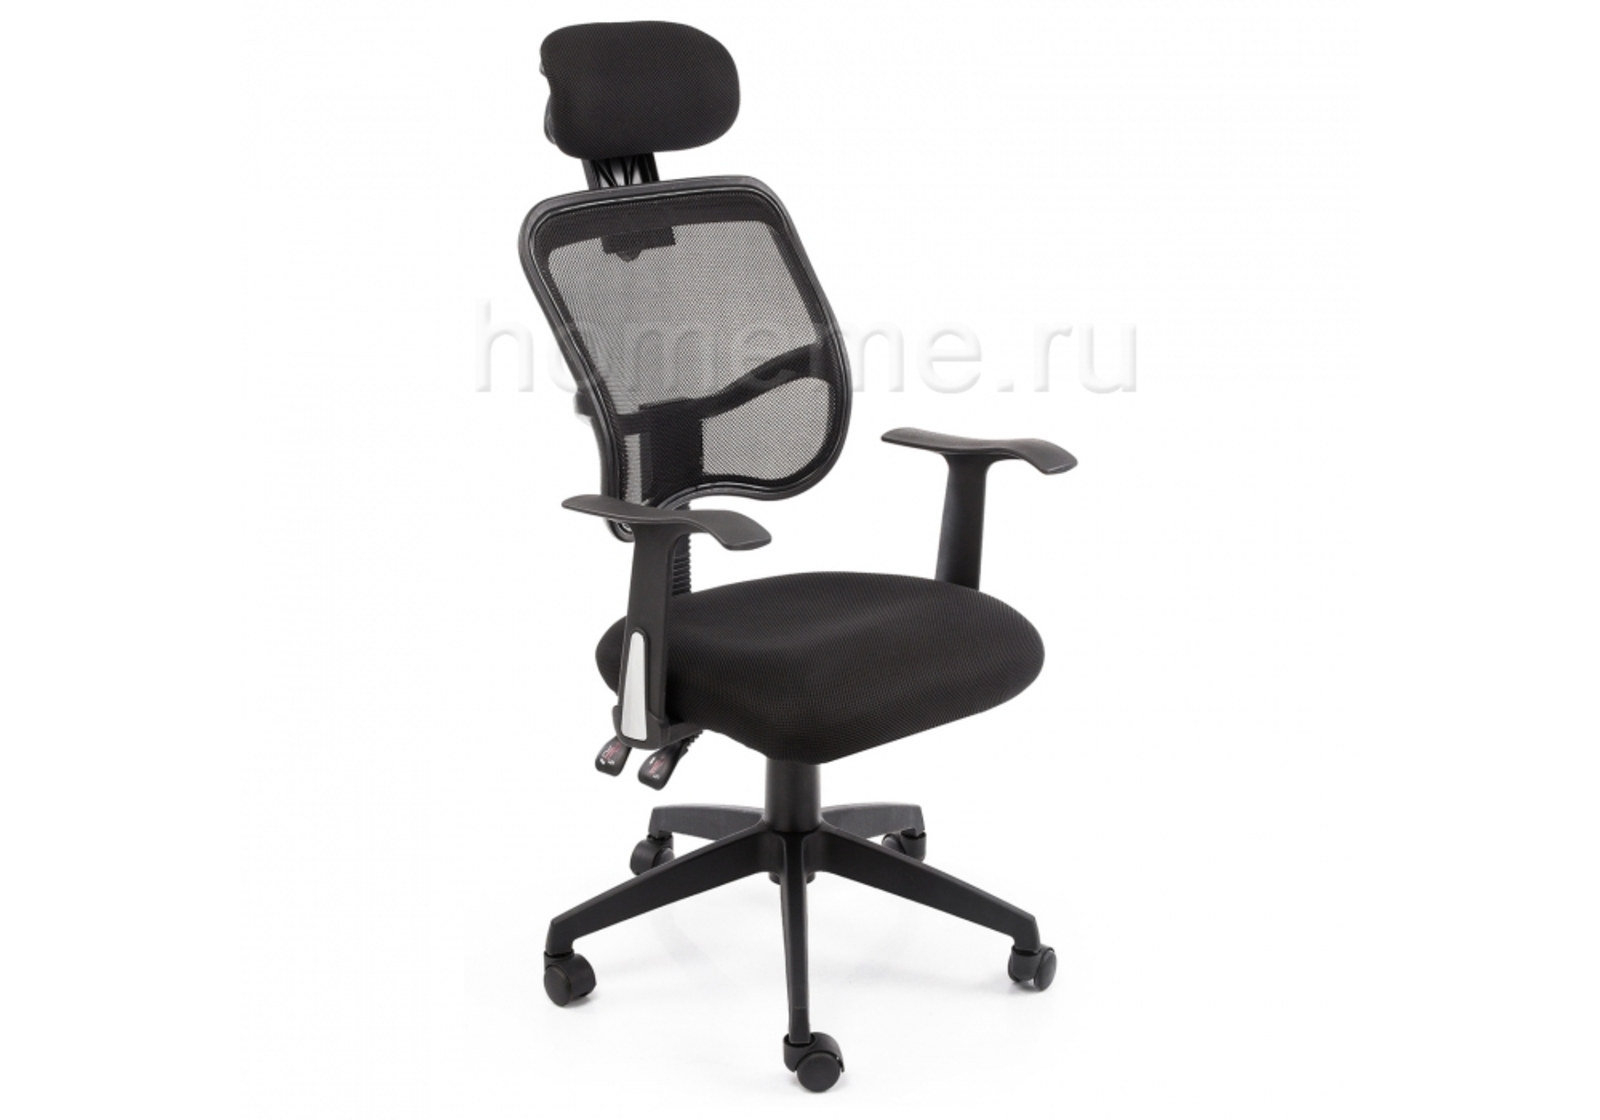 Кресло для офиса HomeMe Lody черное 1658 от Homeme.ru